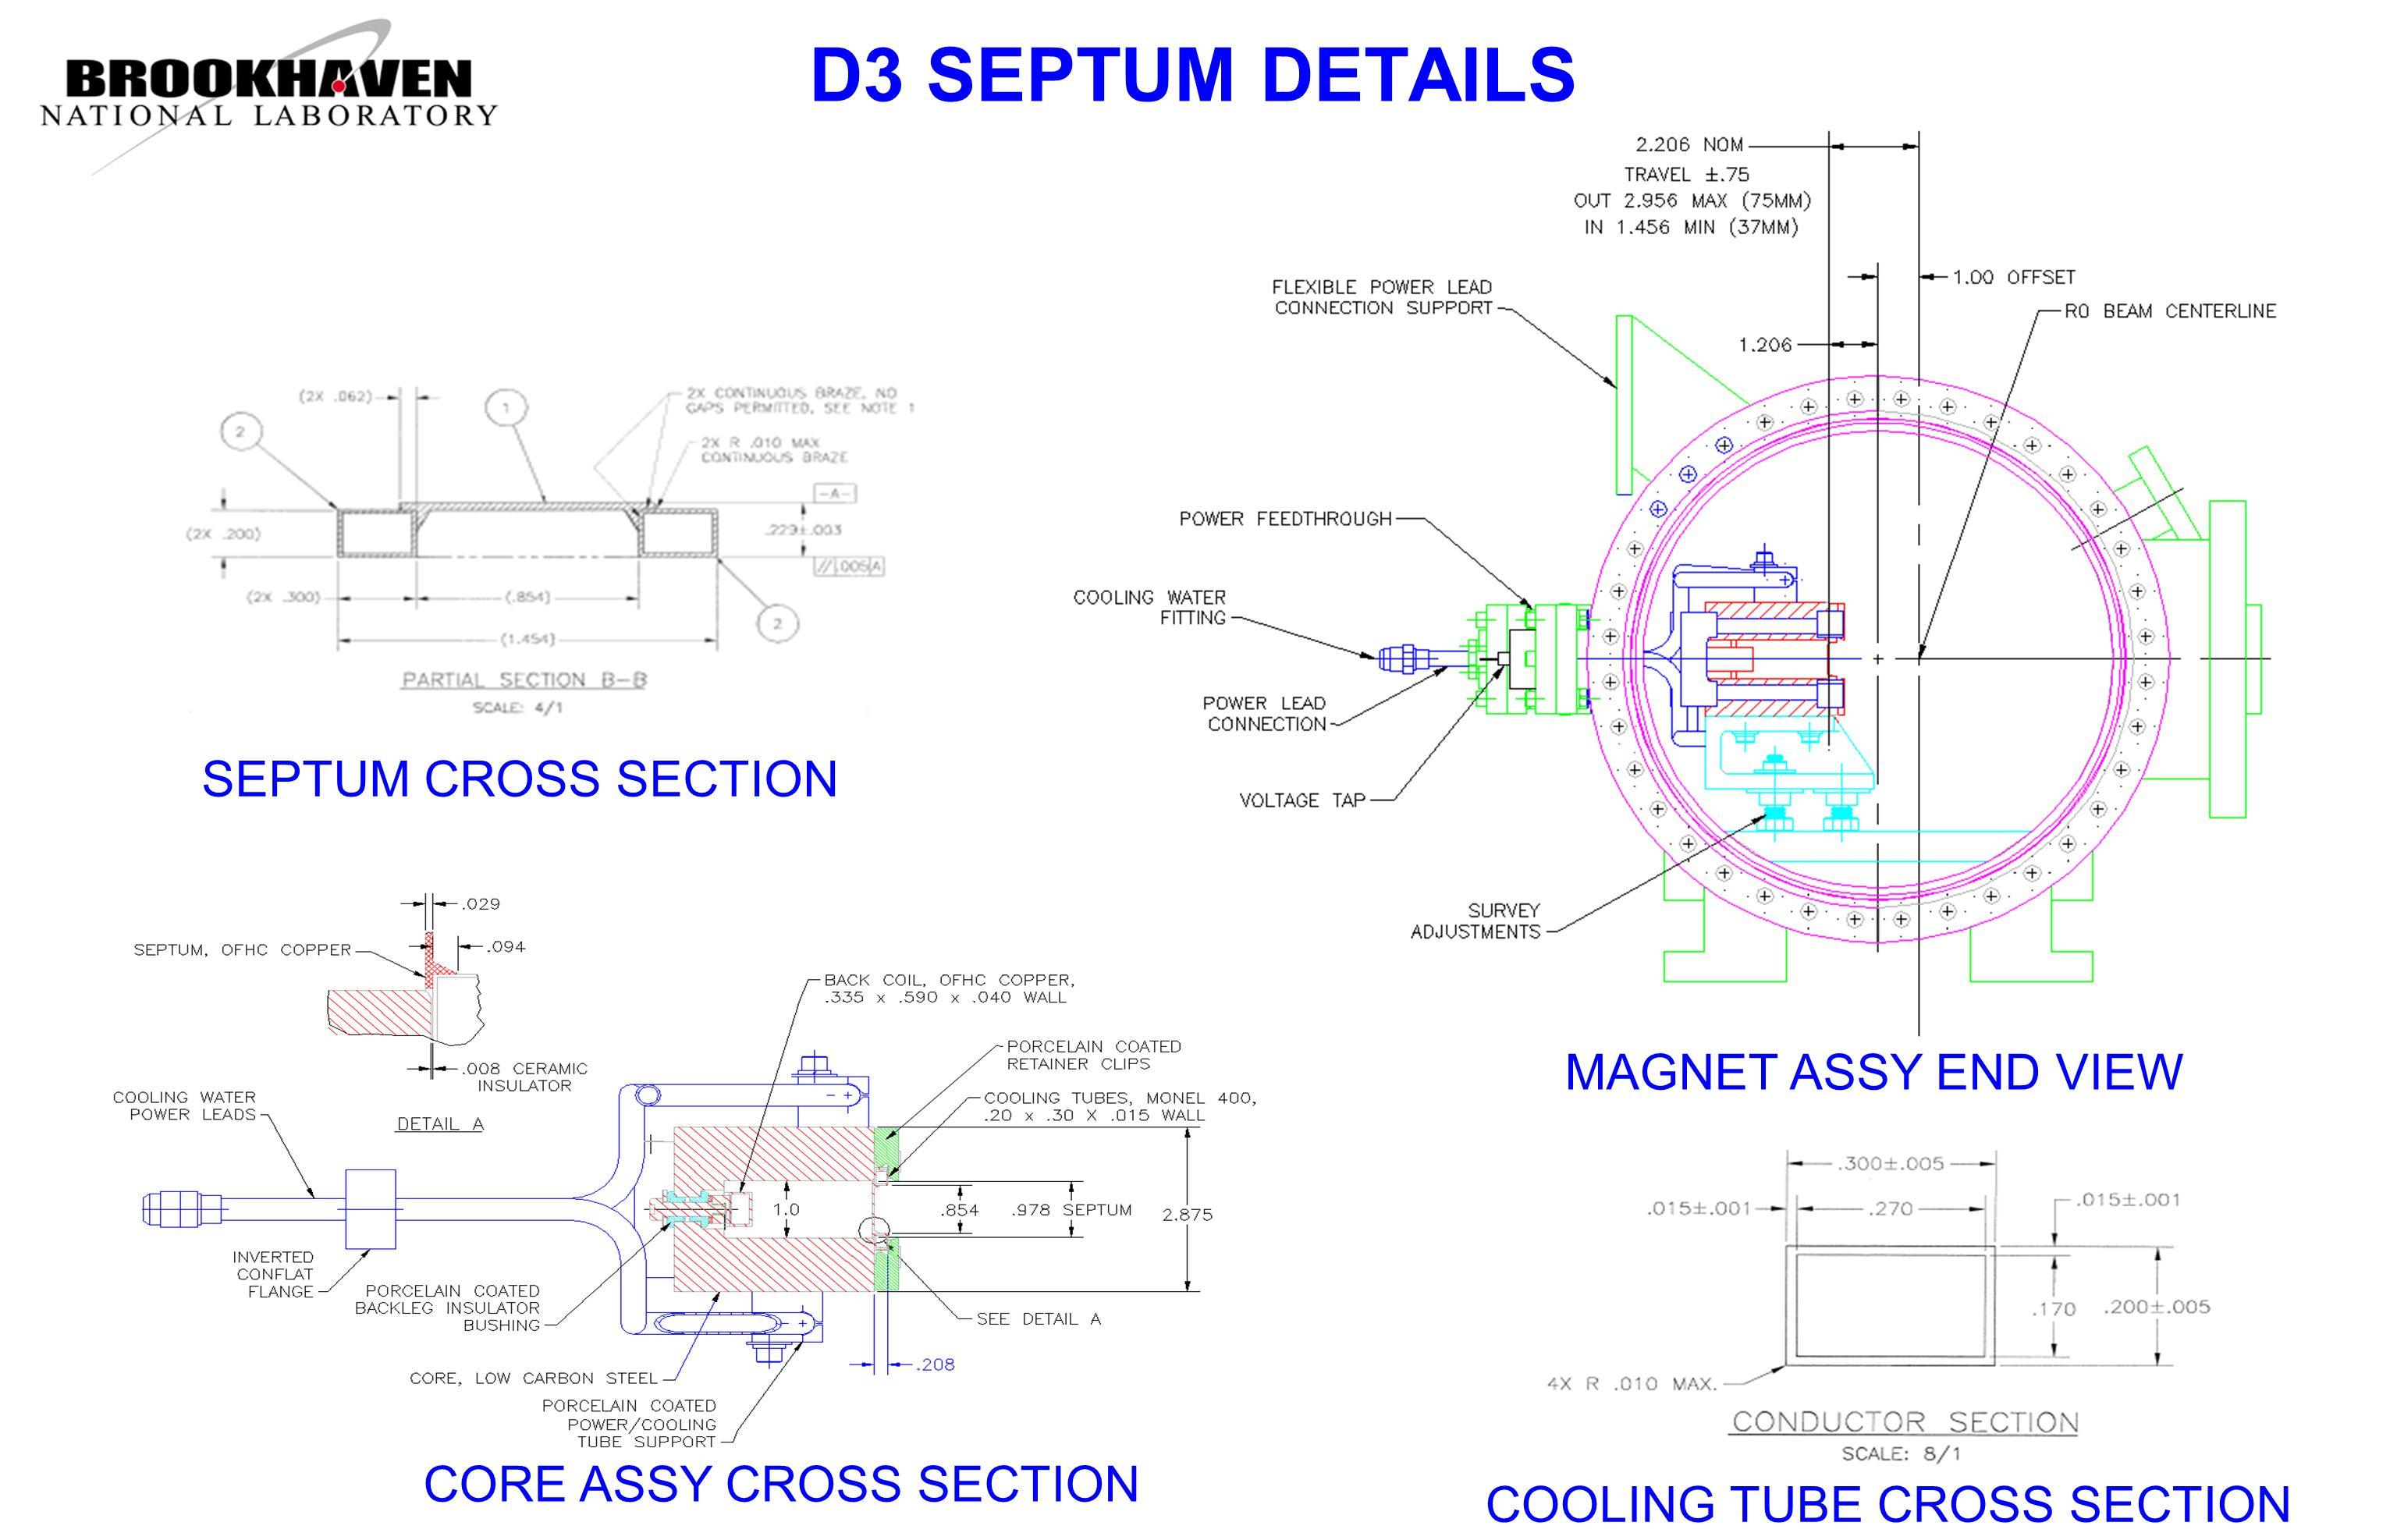 MAGNET ASSY END VIEW SEPTUM CROSS SECTION CORE ASSY CROSS SECTION COOLING TUBE CROSS SECTION D3 SEPTUM DETAILS